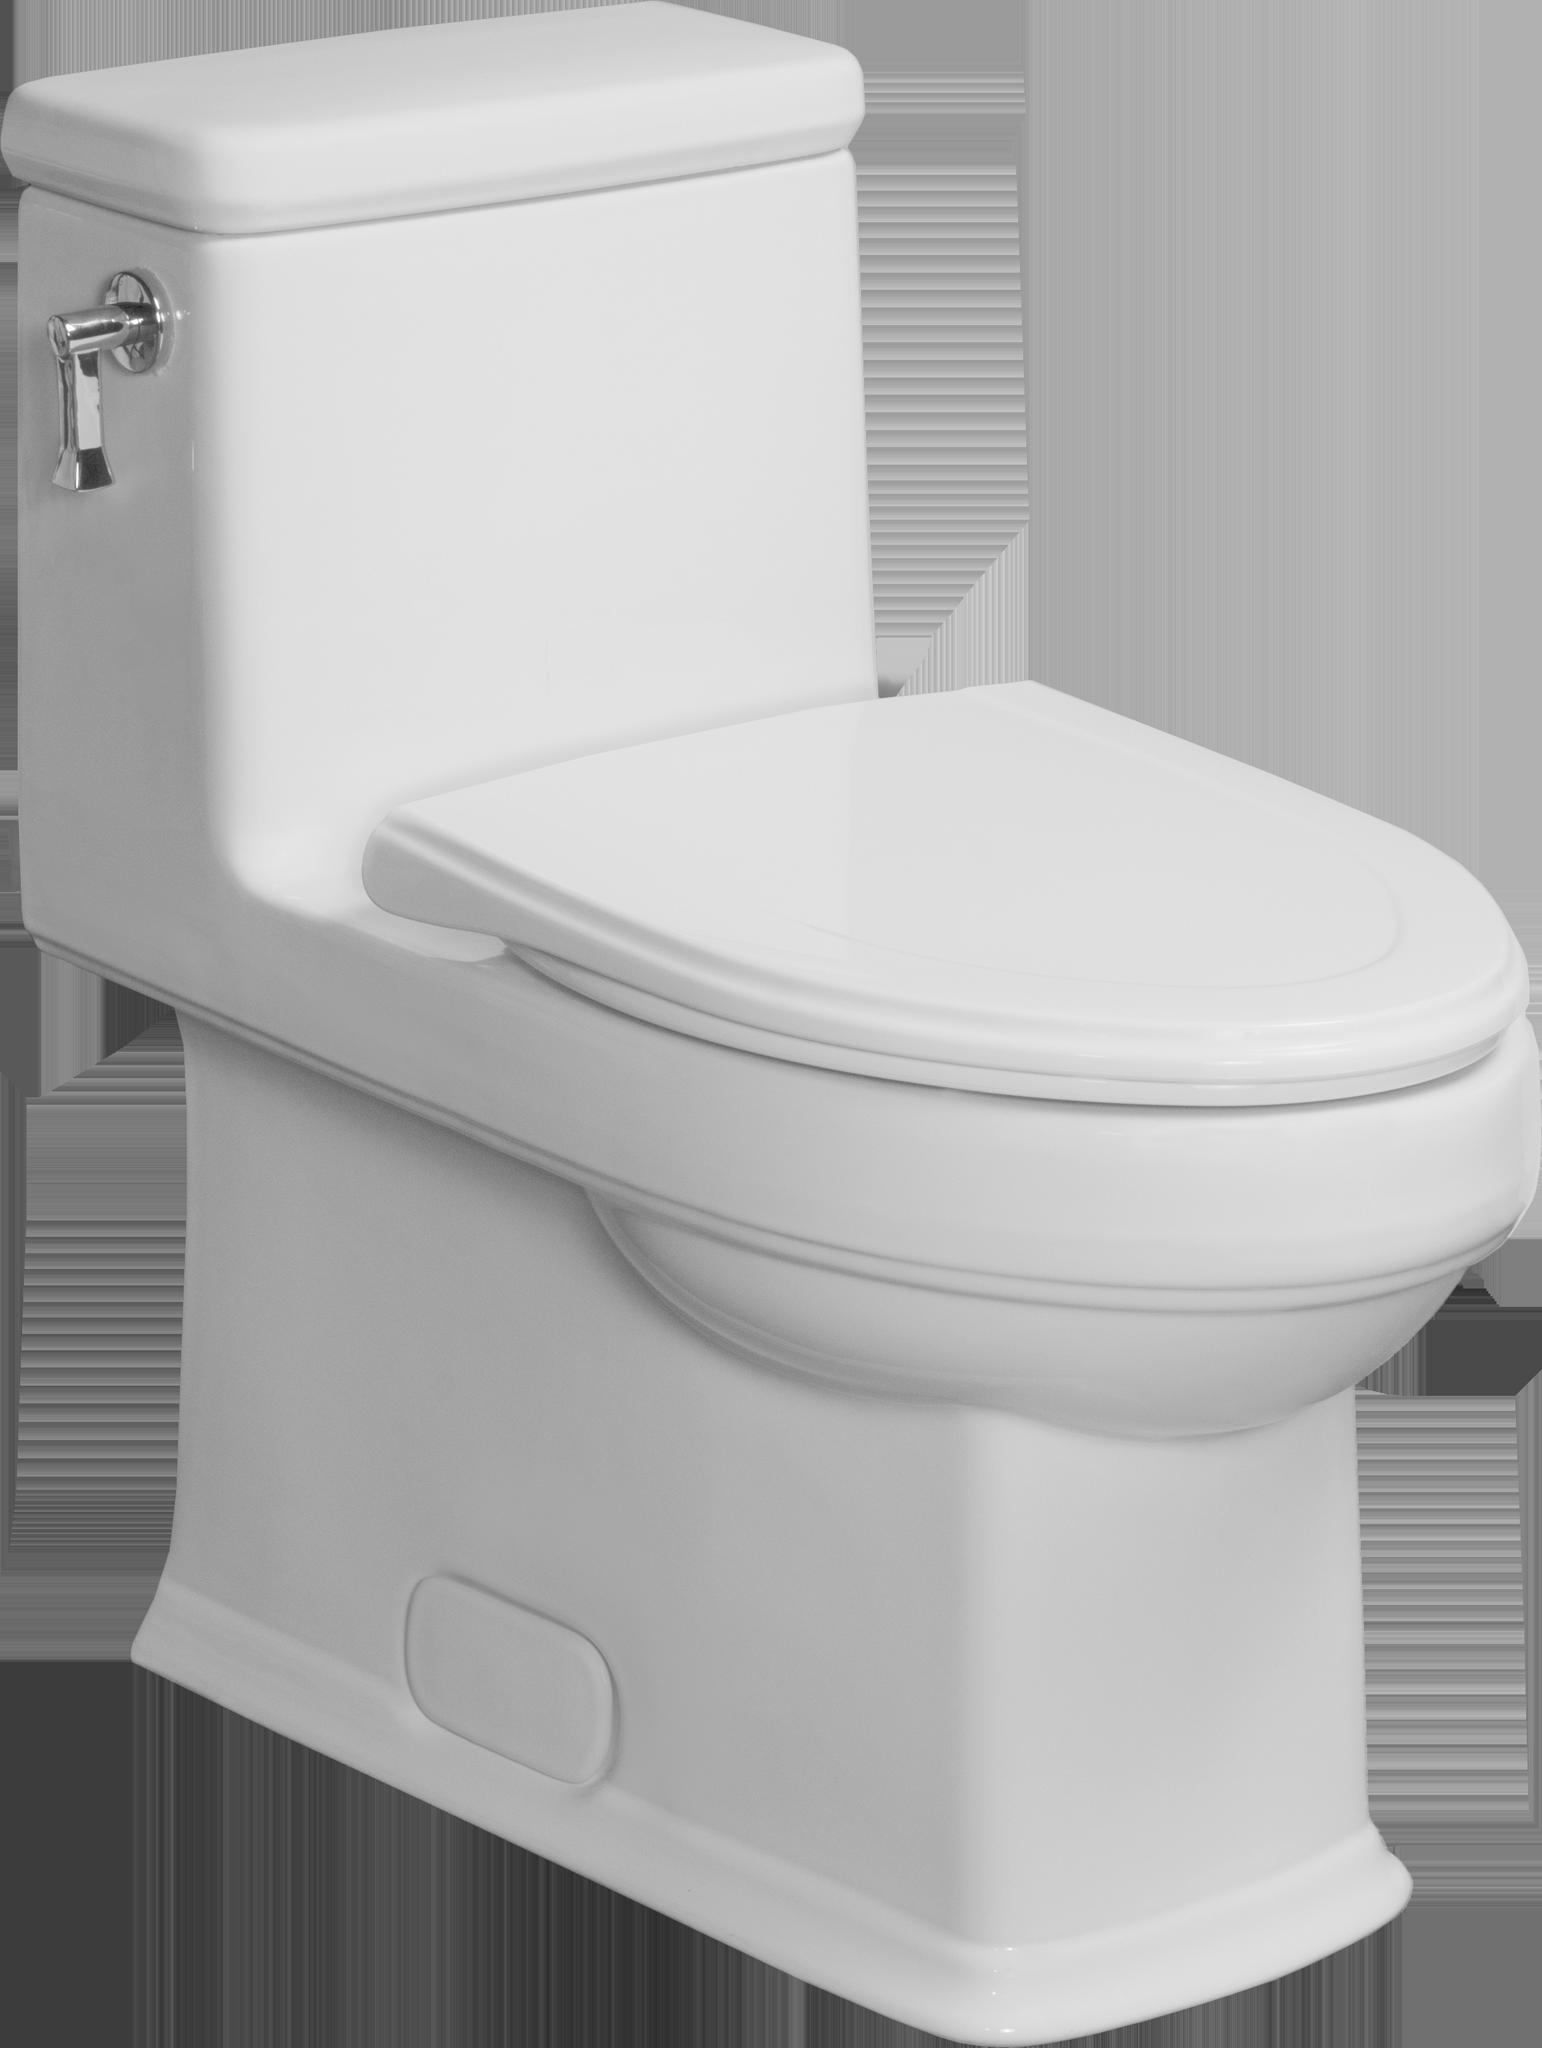 Cool us toilet photos bathtub for bathroom ideas - Abattant wc taille non standard ...